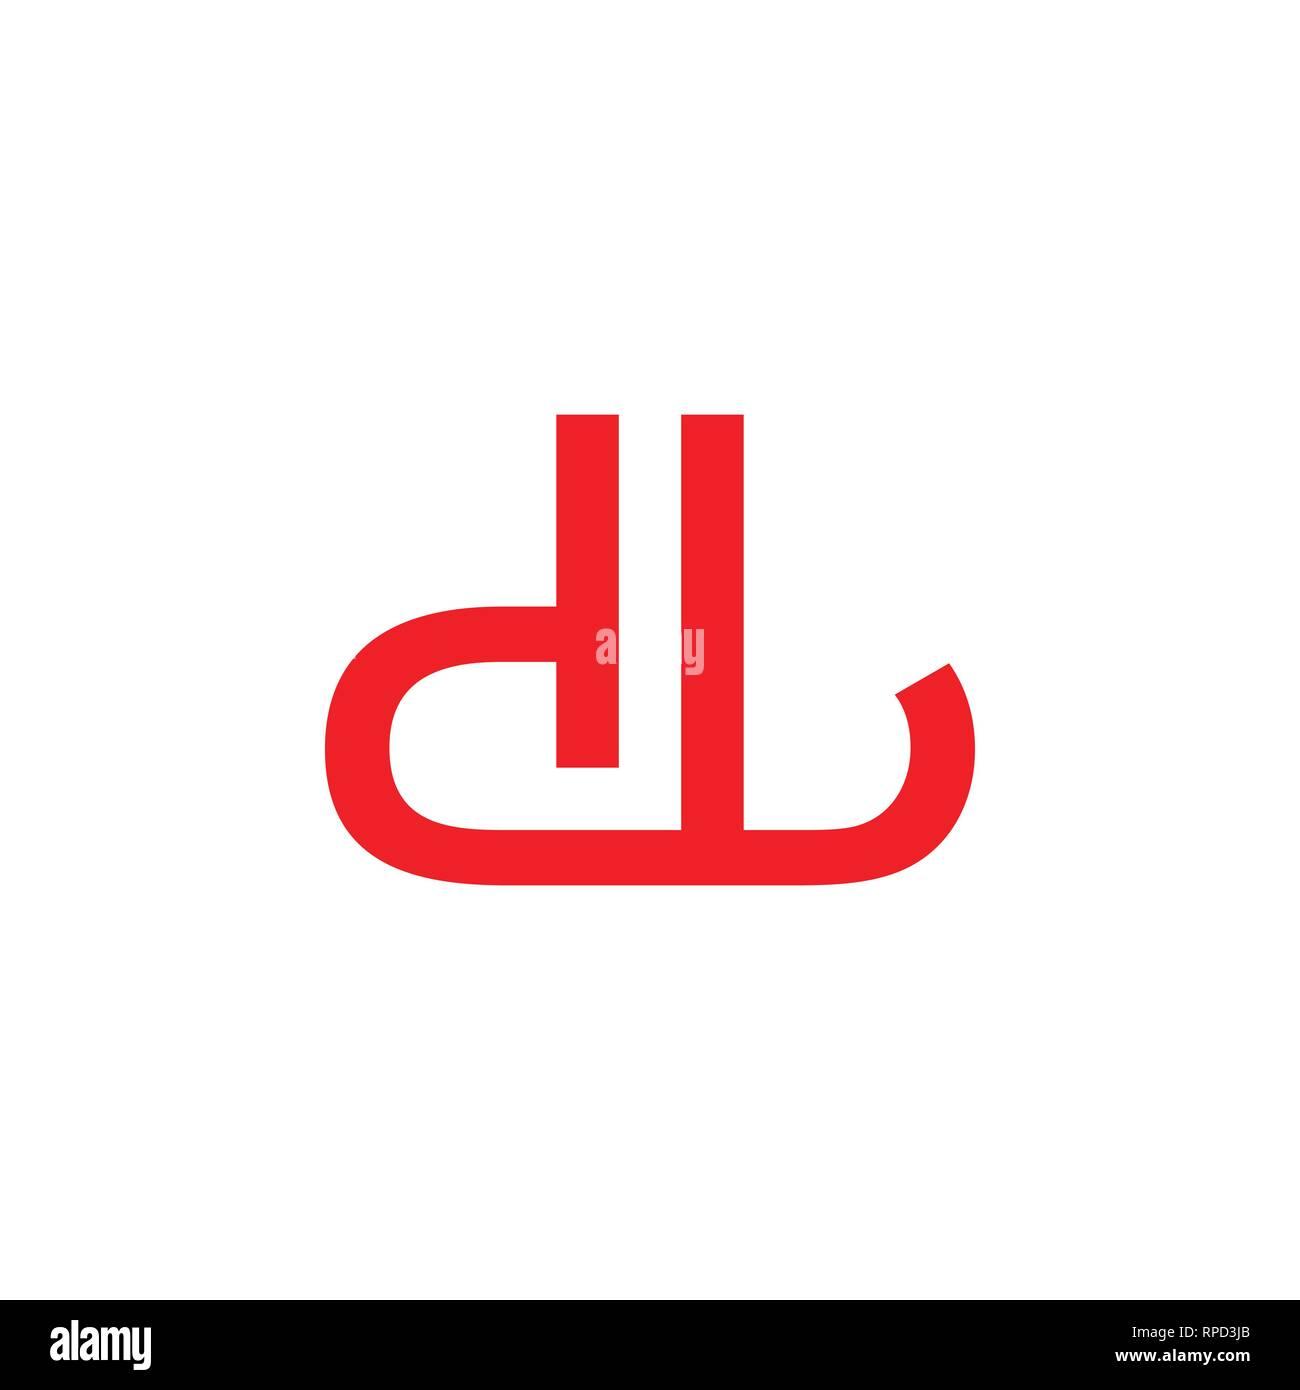 Letter Dl Simple Geometric Line Simple Brand Logo Stock Vector Image Art Alamy